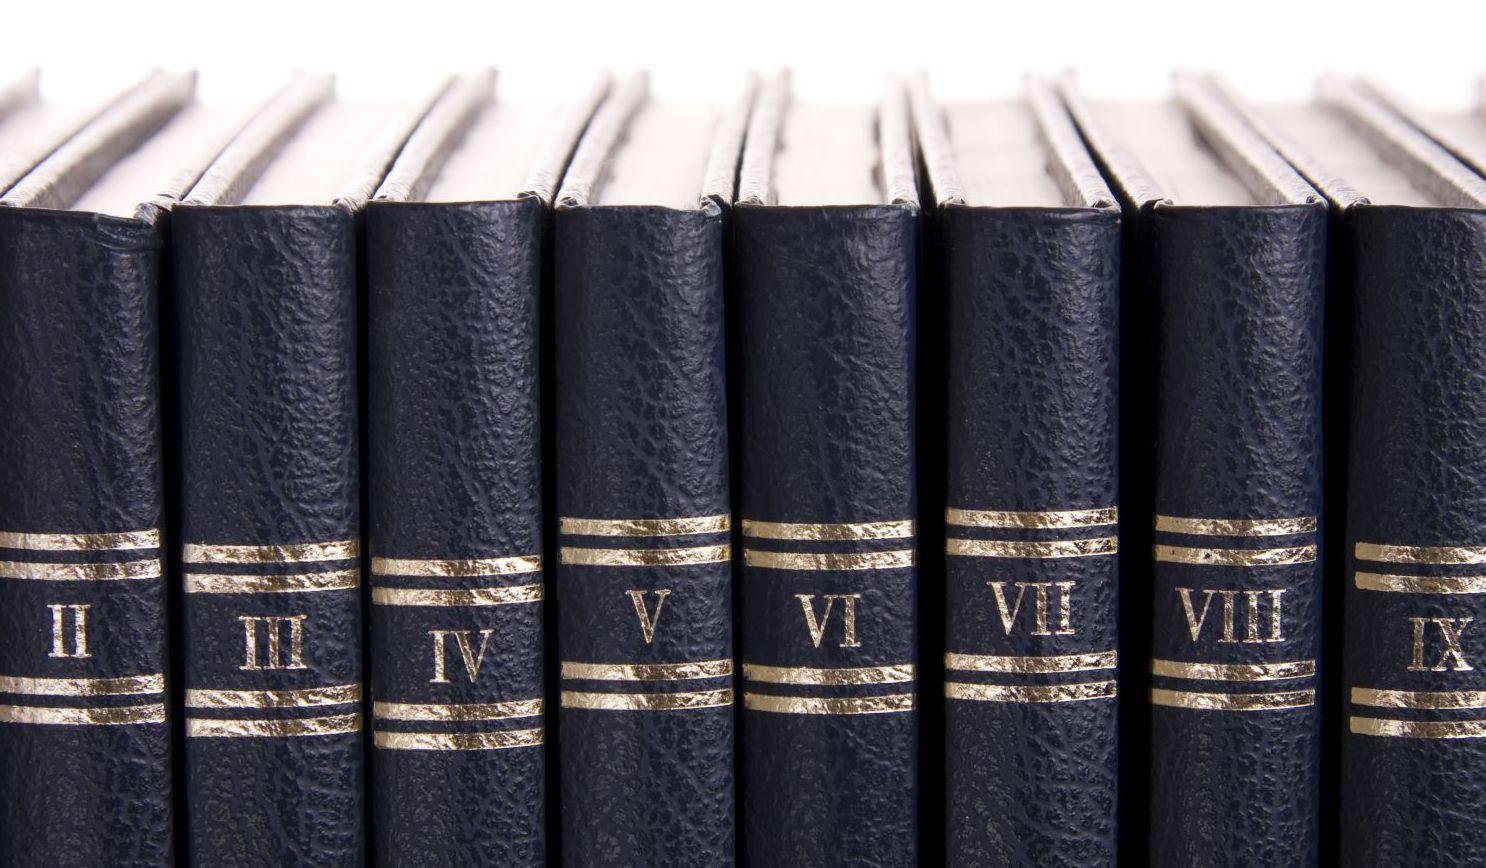 Elberta, AL's legal support books